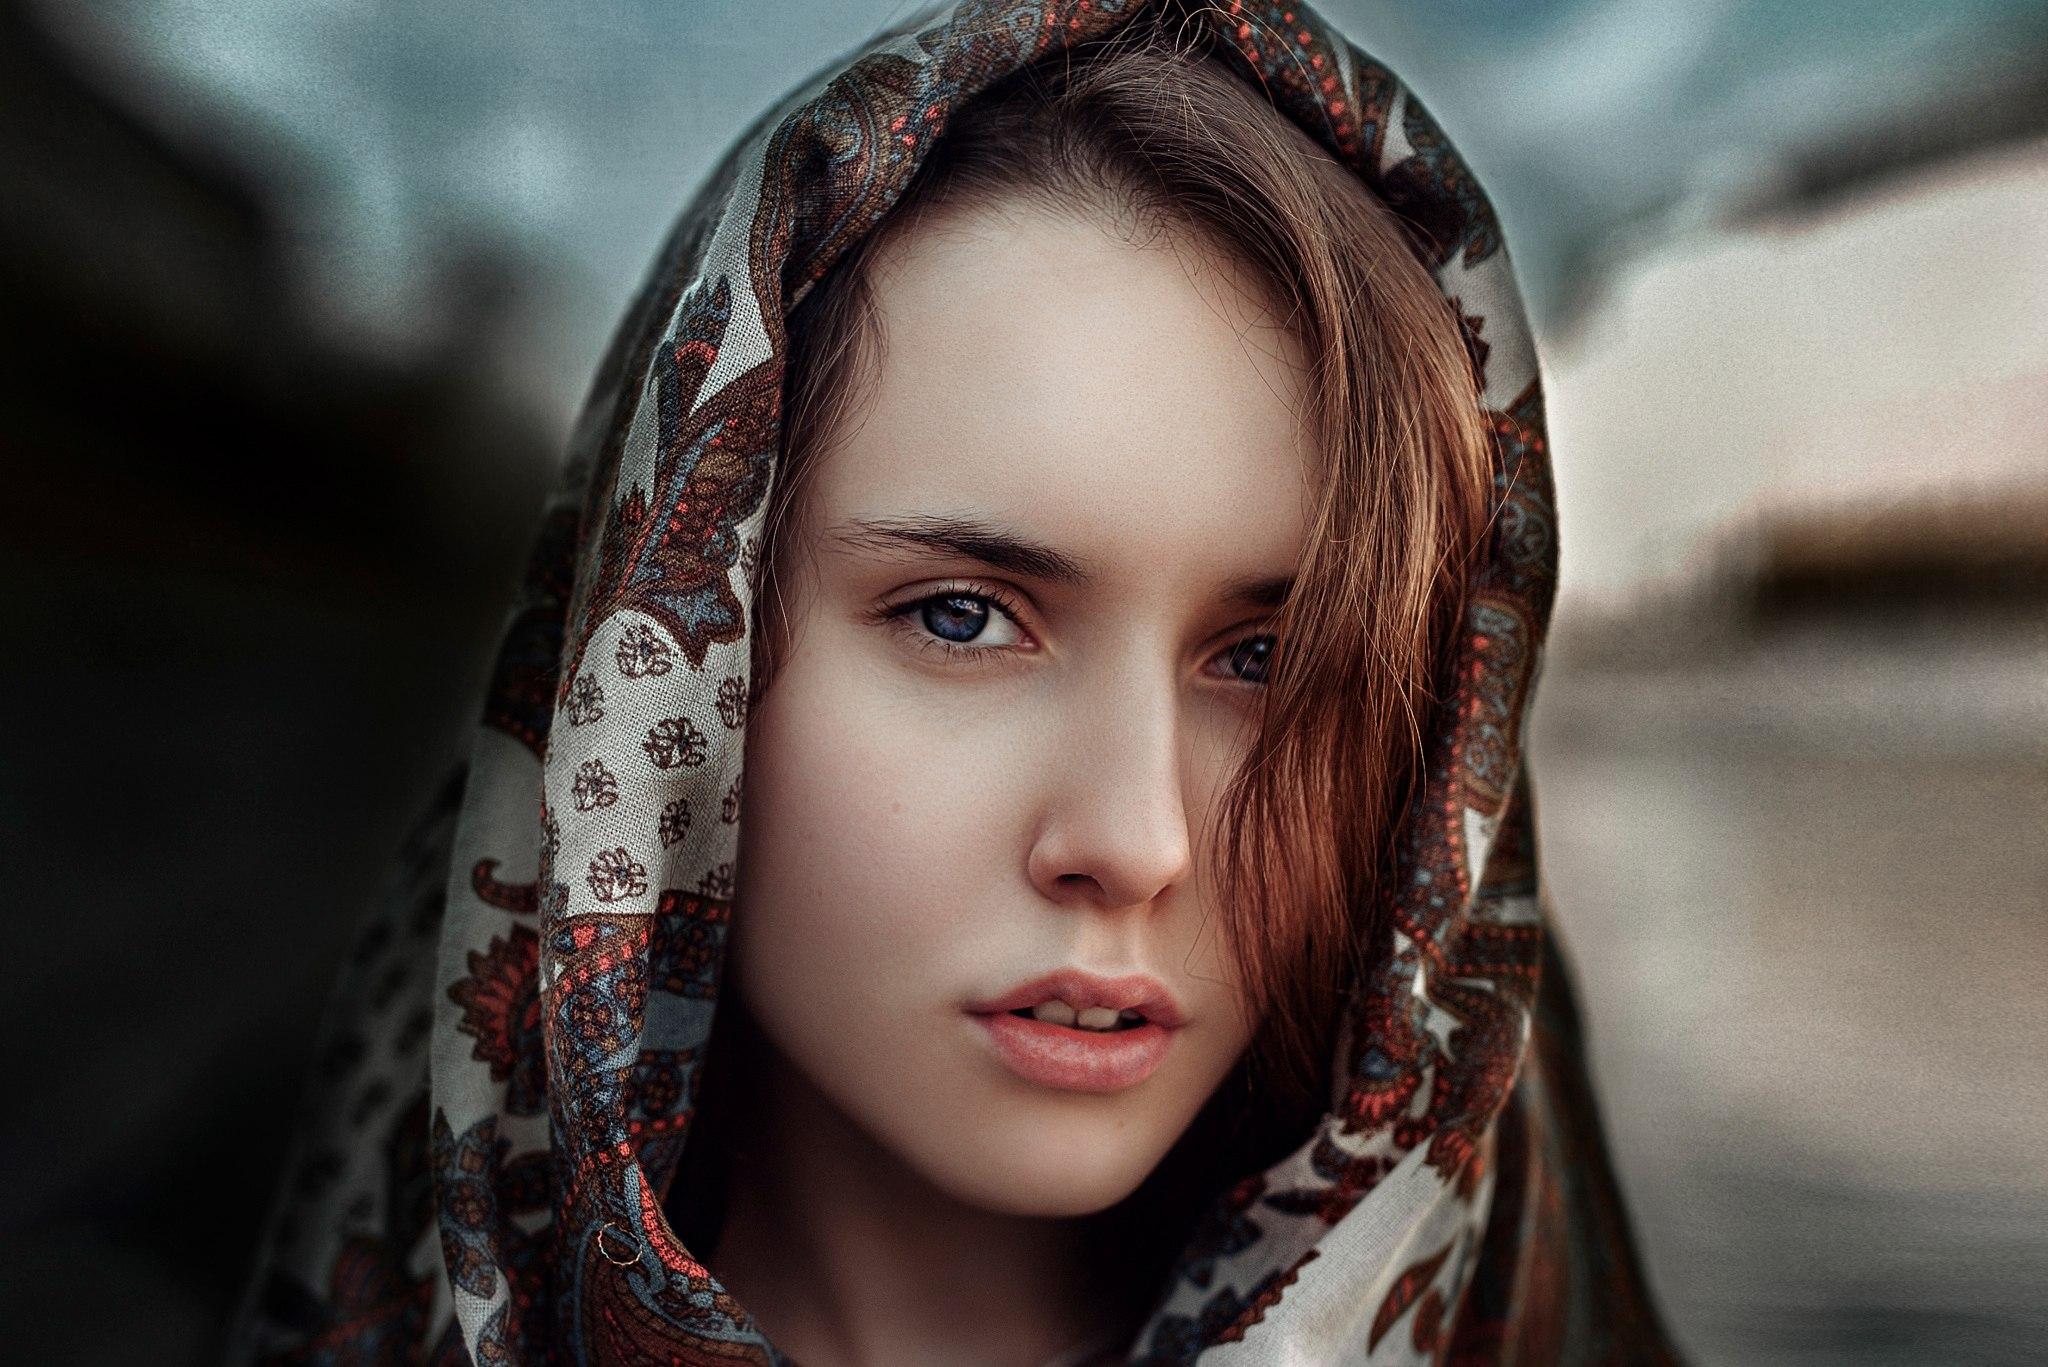 proza-krasivie-foto-russkih-krasavits-prirode-volosatoy